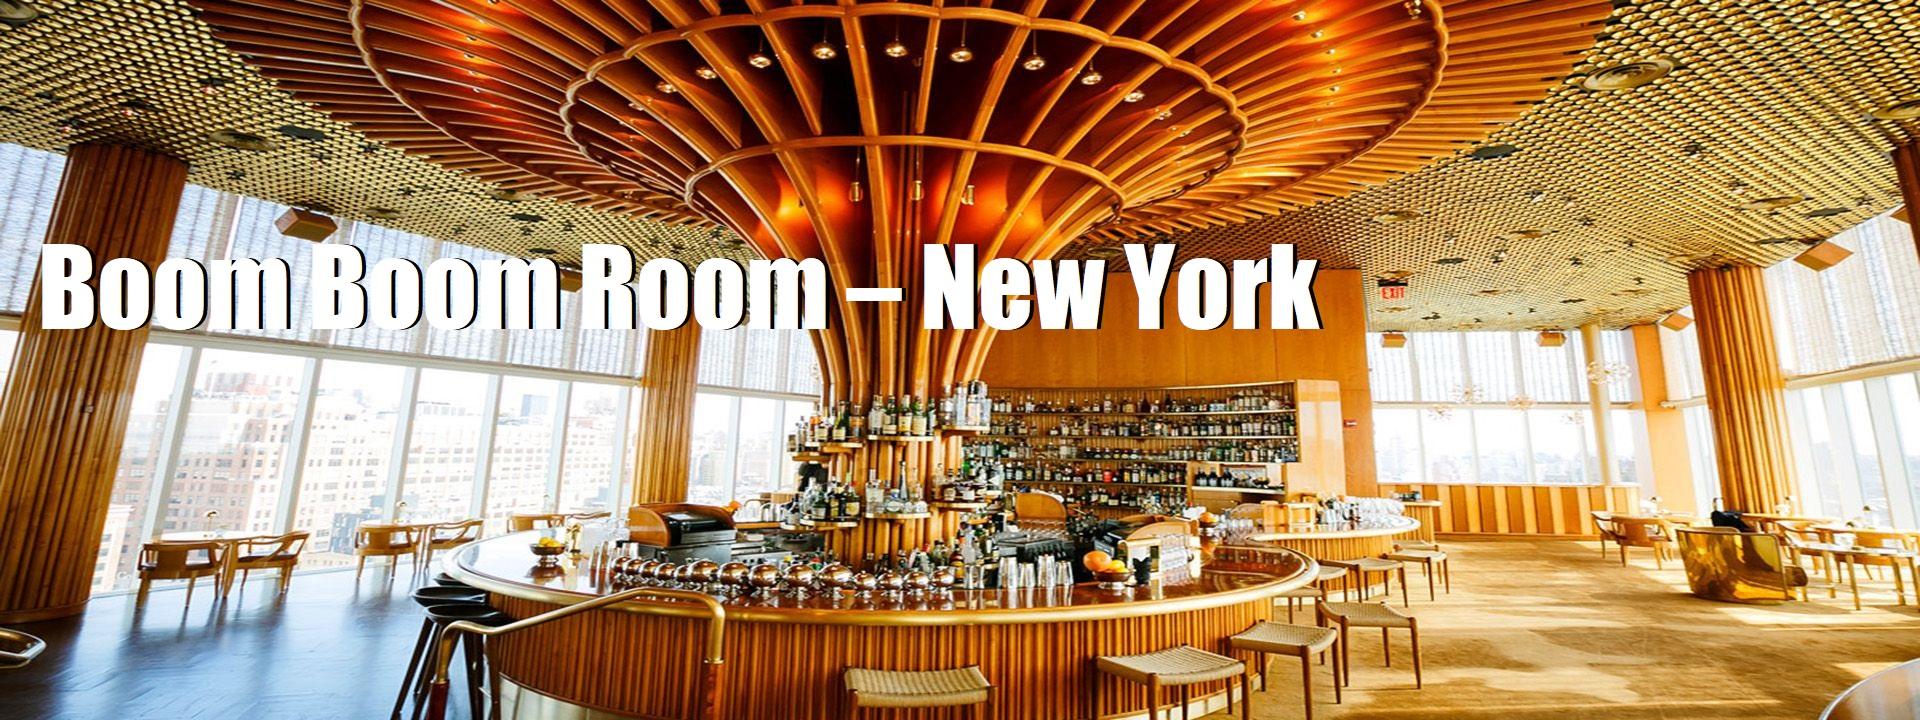 Boom Boom Room – New York